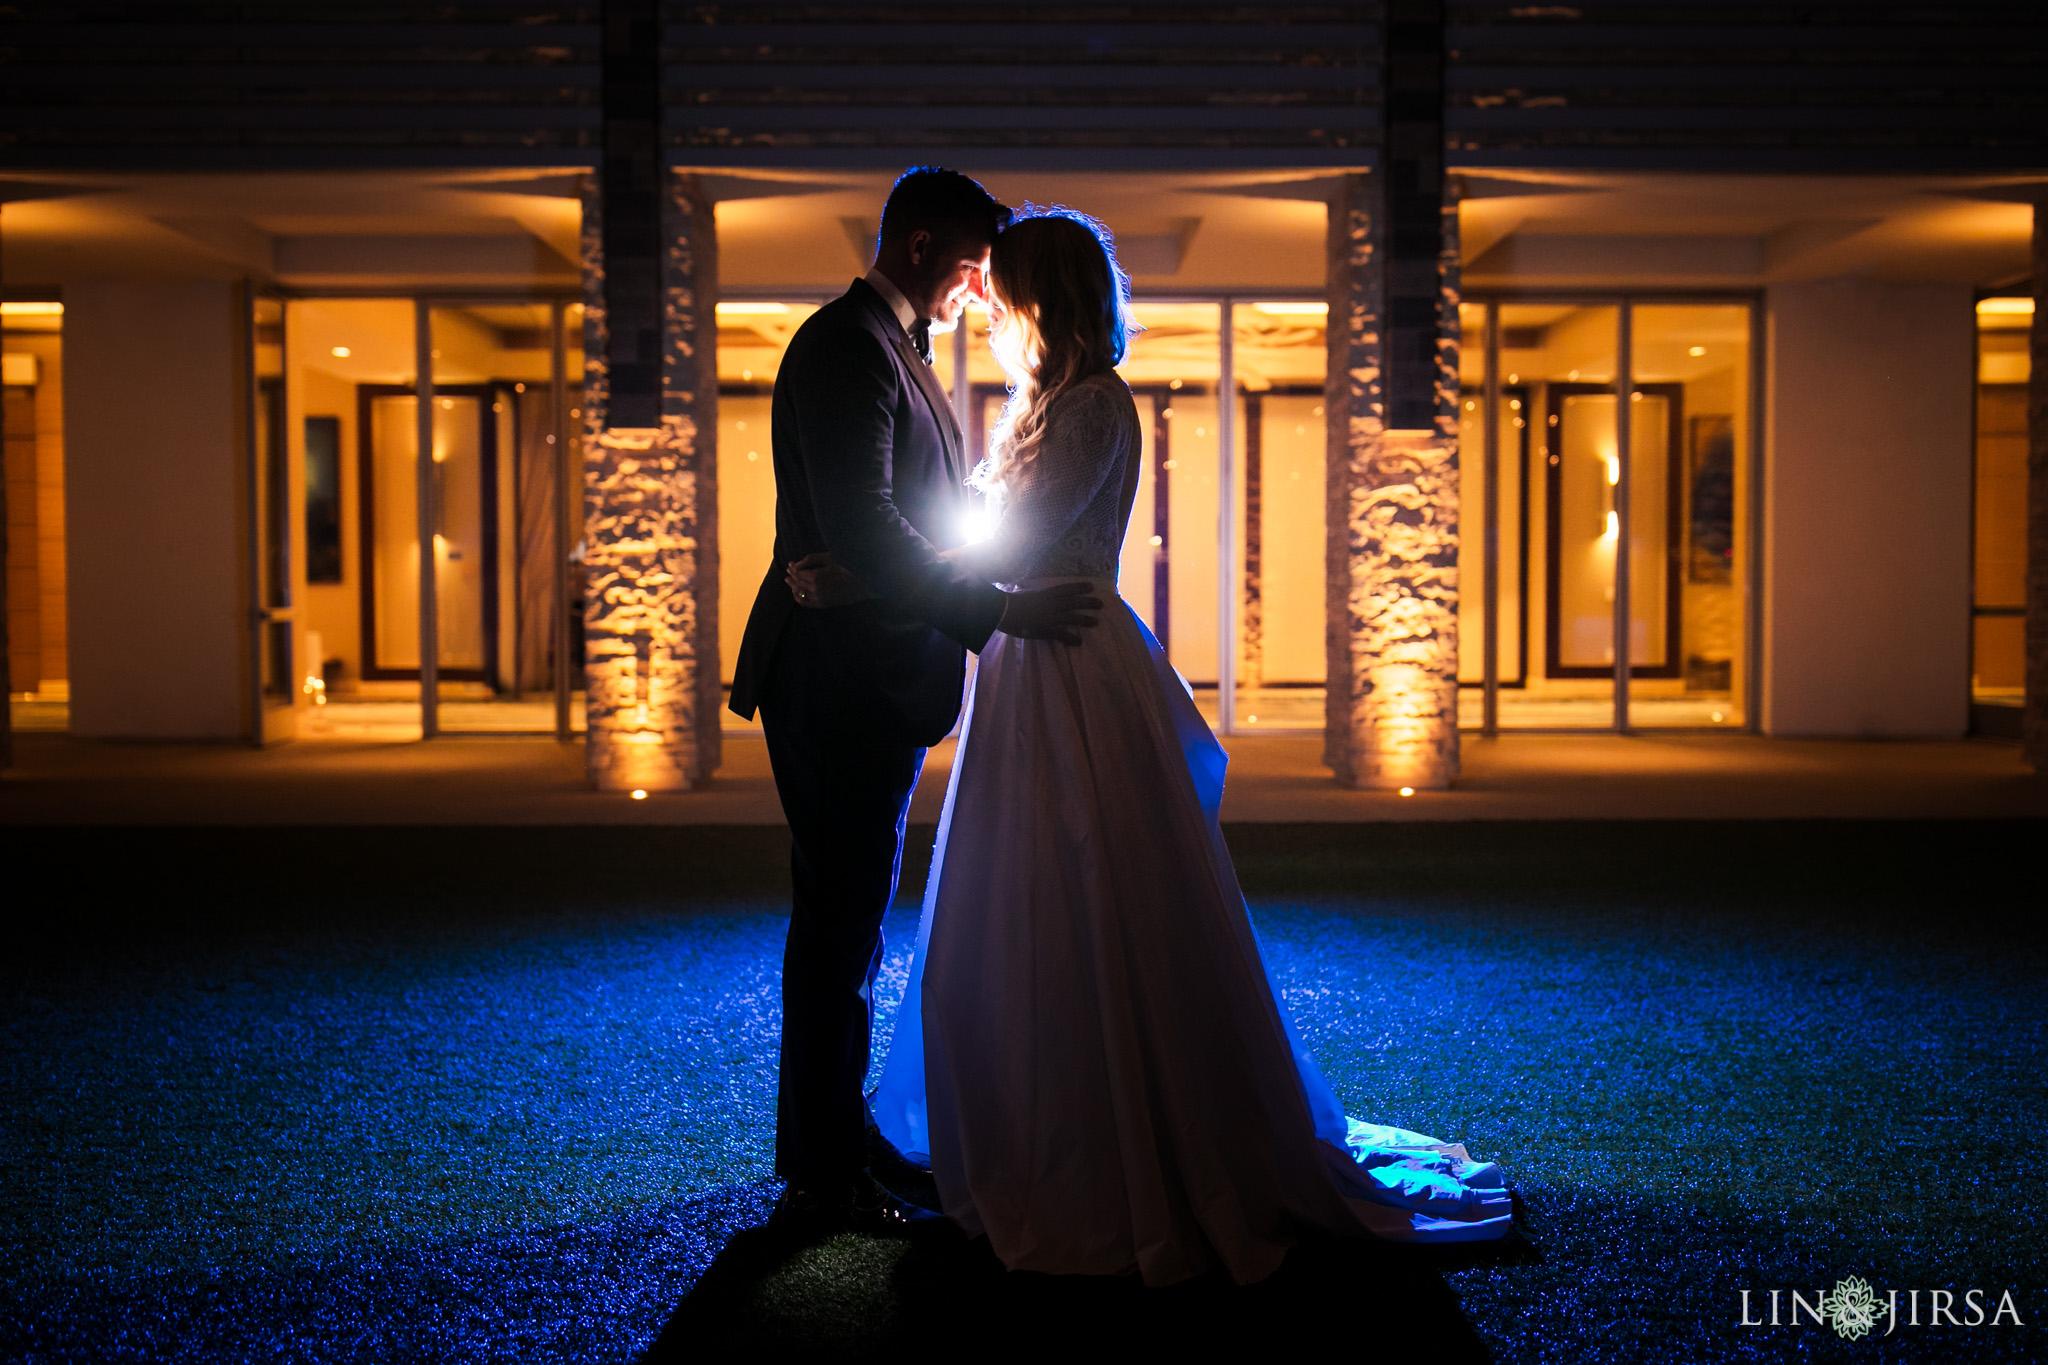 pasea hotel and spa wedding lin and jirsa photography